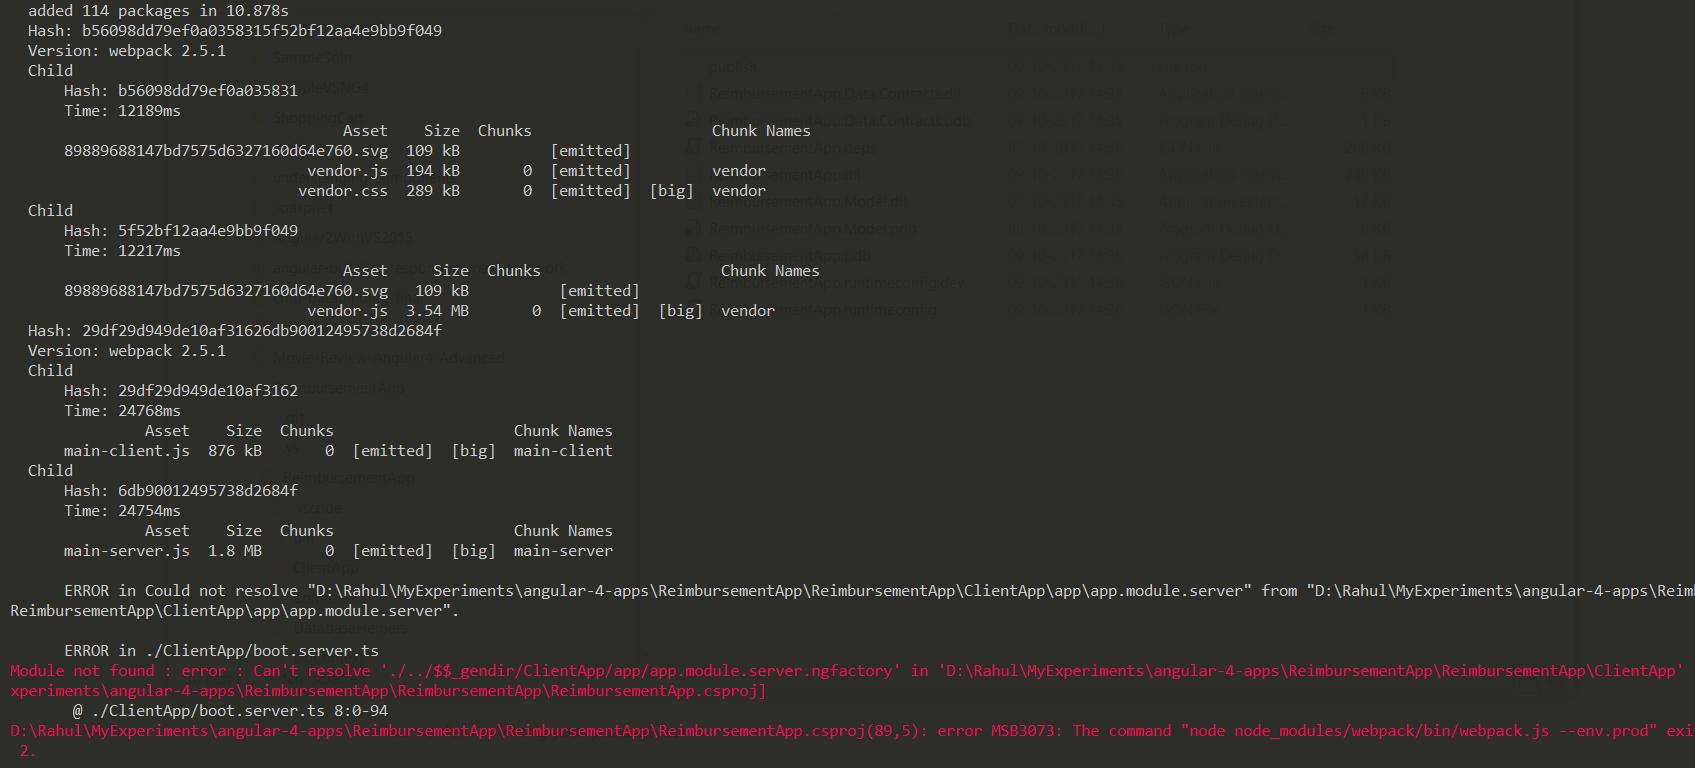 ERROR in  /ClientApp/boot server ts Module not found : error : Can't